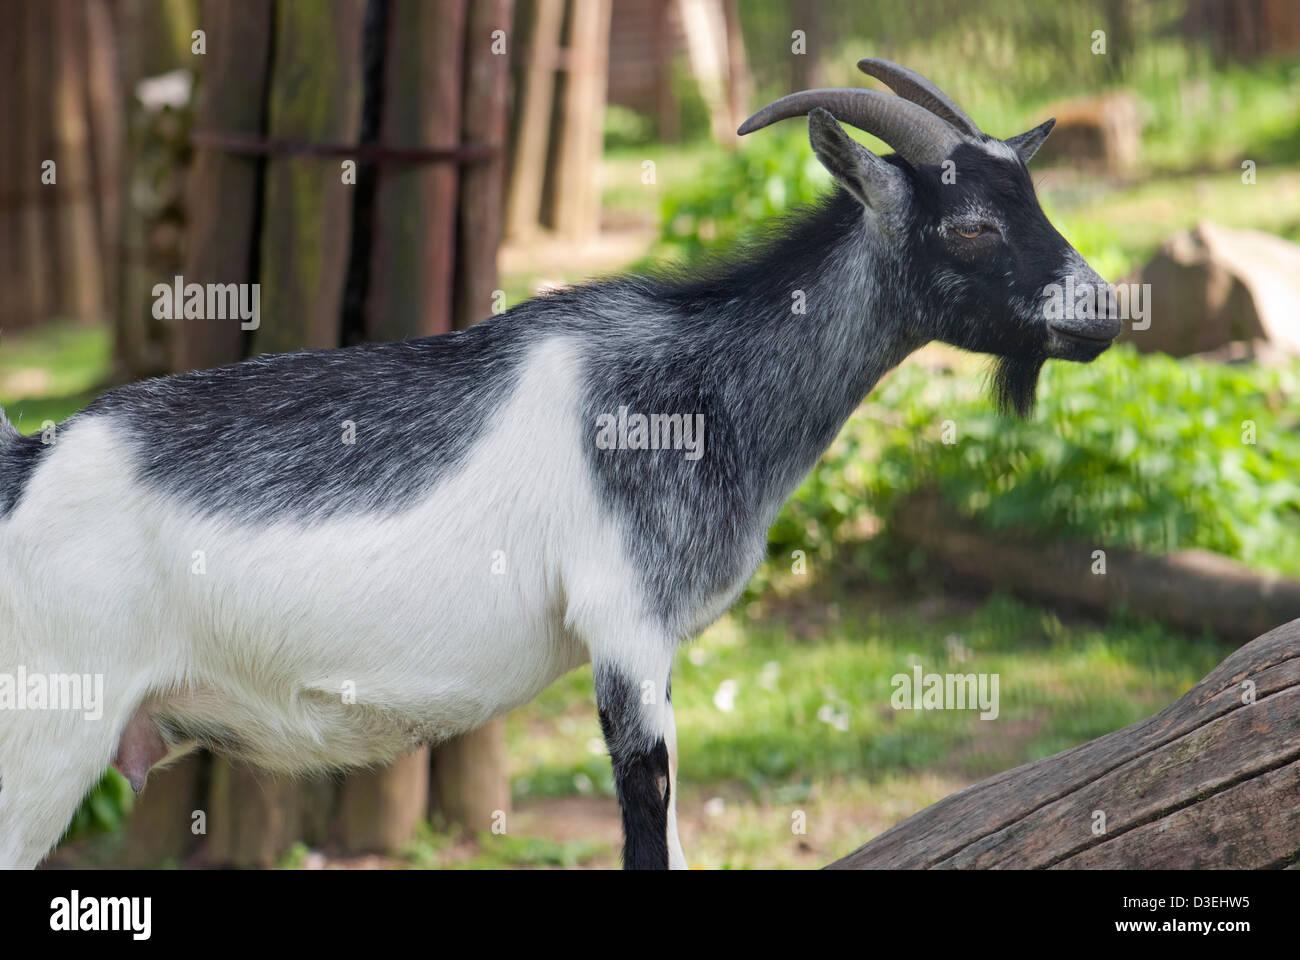 Pygmy goat home (Capra hircus) - Stock Image